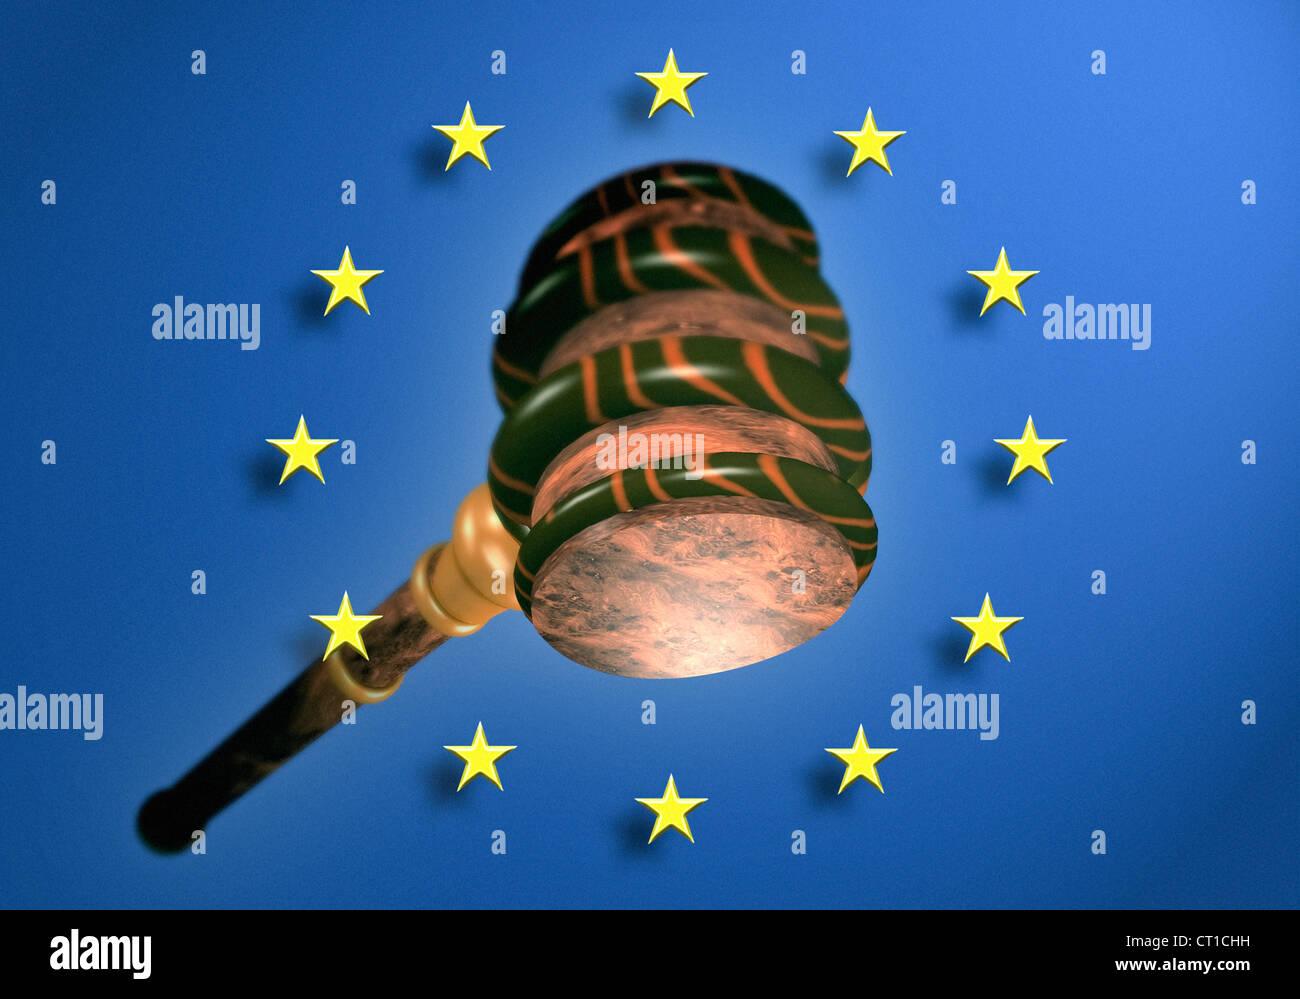 Gavel or auction hammer with European flag - Richter Hammer oder Auktionshammer vor Europa Fahne - Stock Image